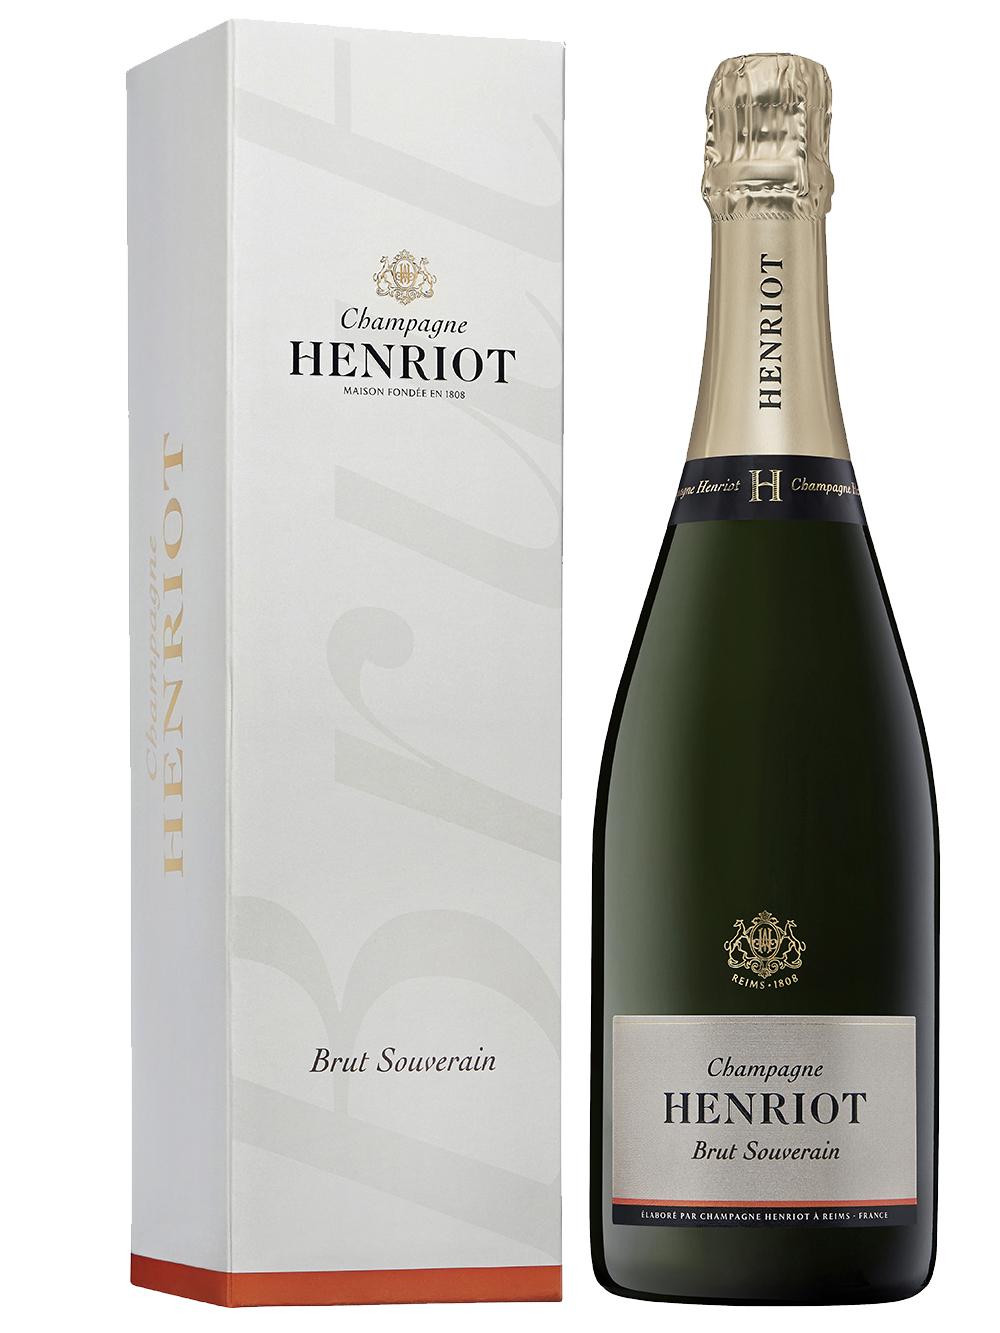 Henriot Brut Souverain giftbox